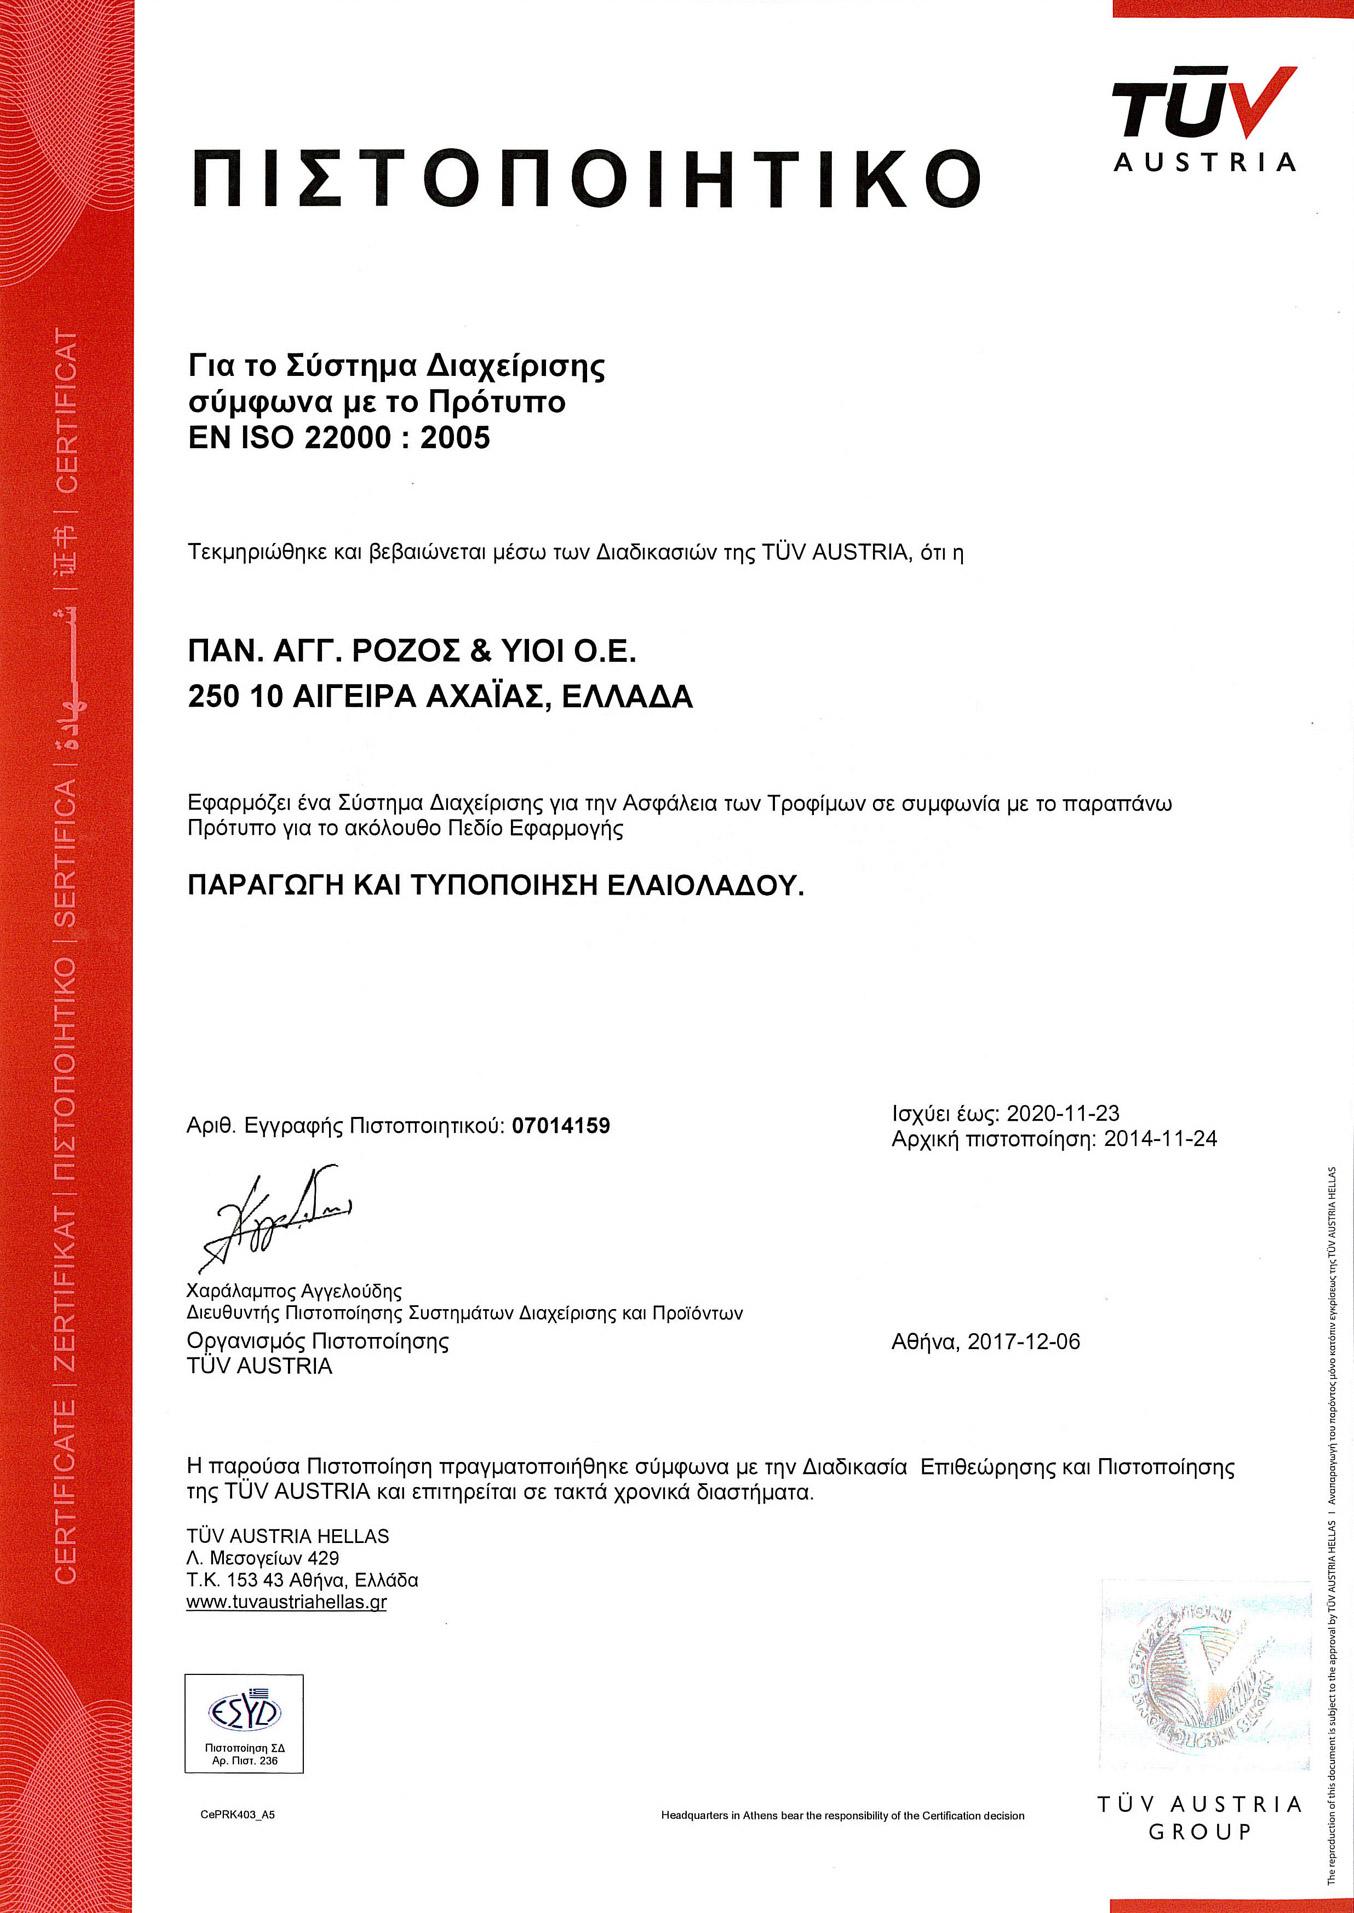 TUV-Certification-Rozos-Oil_ISO-22000-2005-HACCP-GR